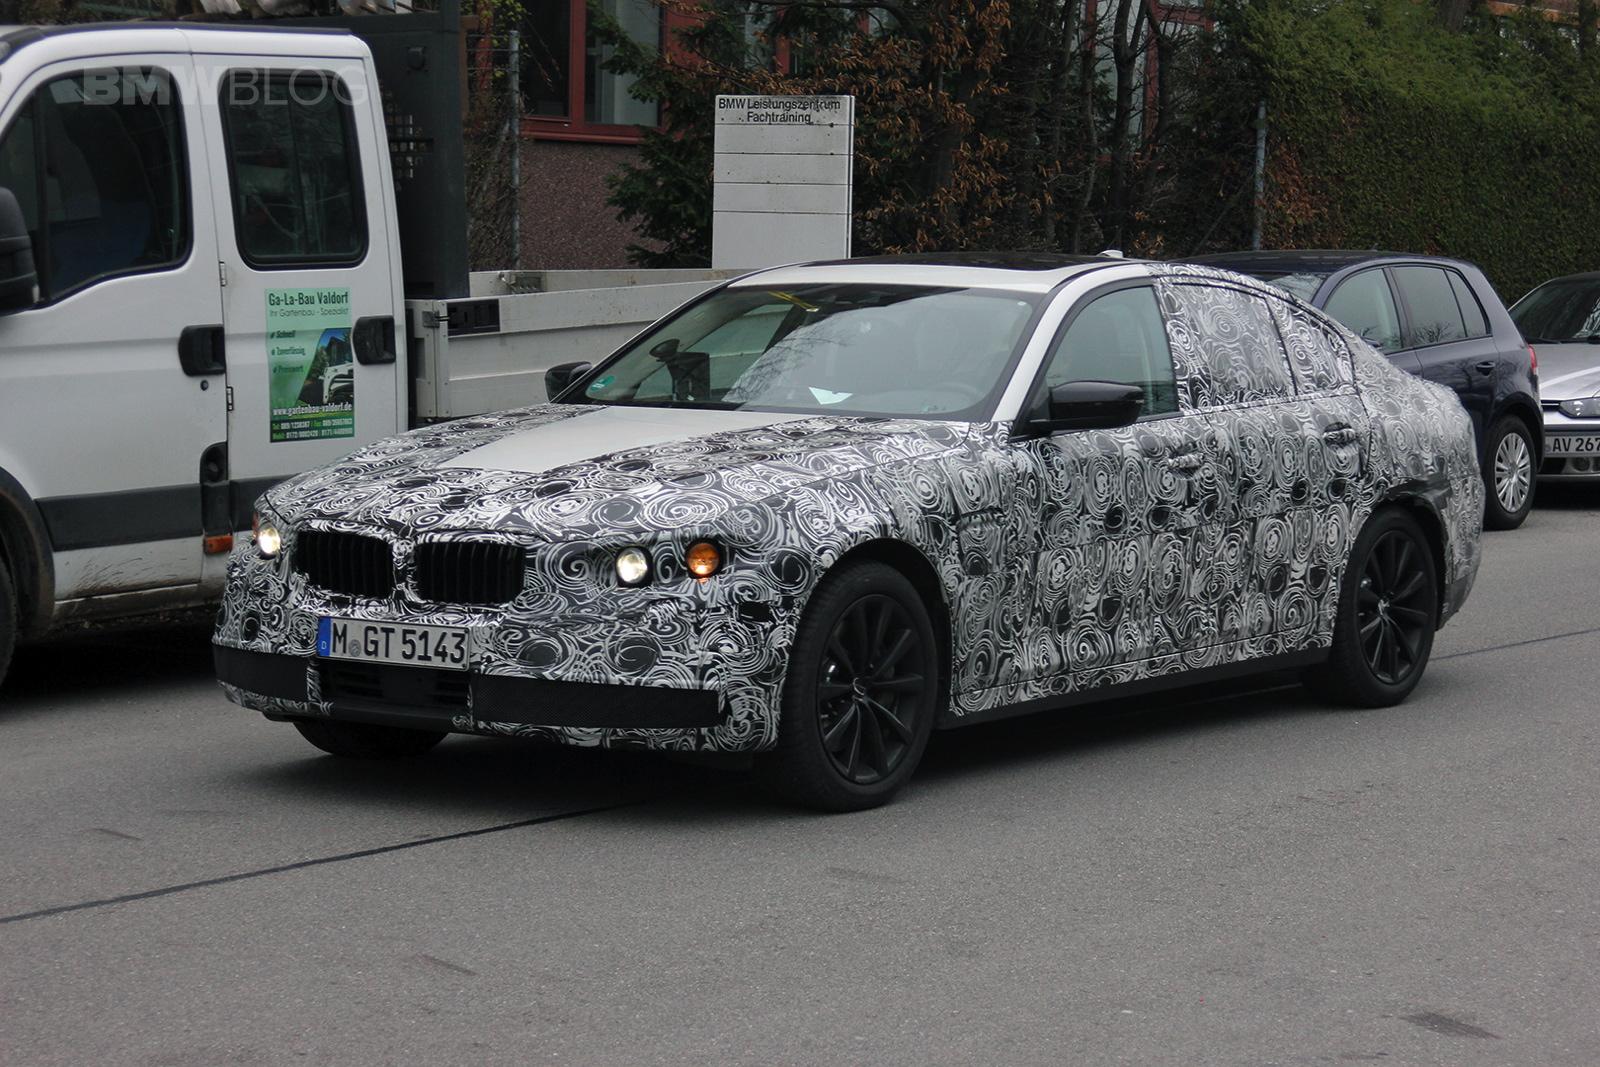 2018 BMW 3 Series spied 04